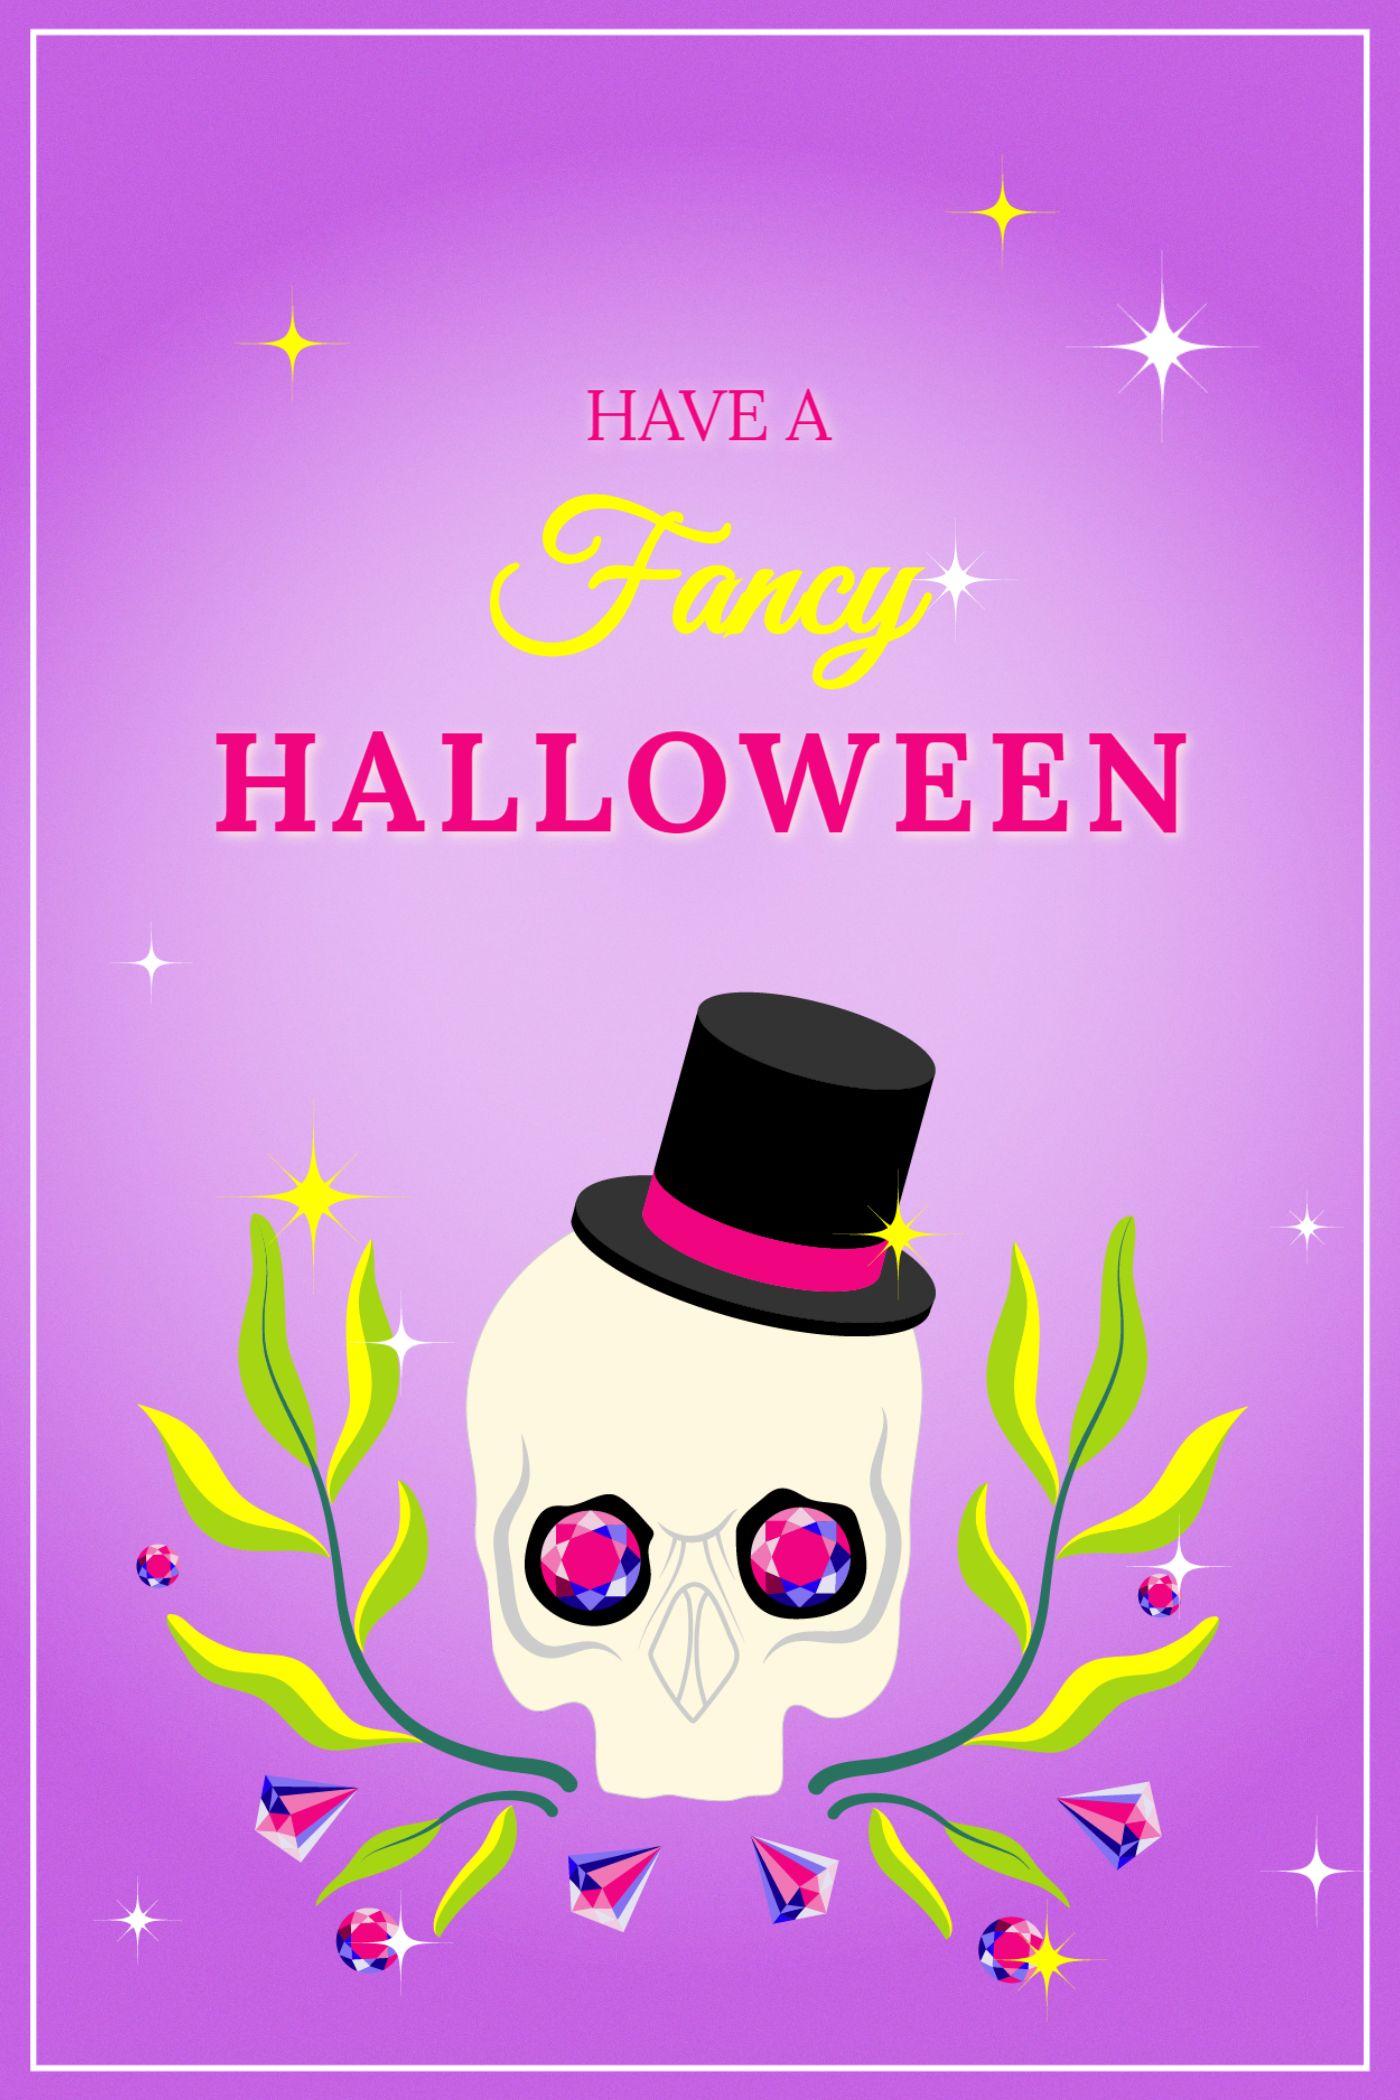 Diamond and skull Halloween Greeting Card Template